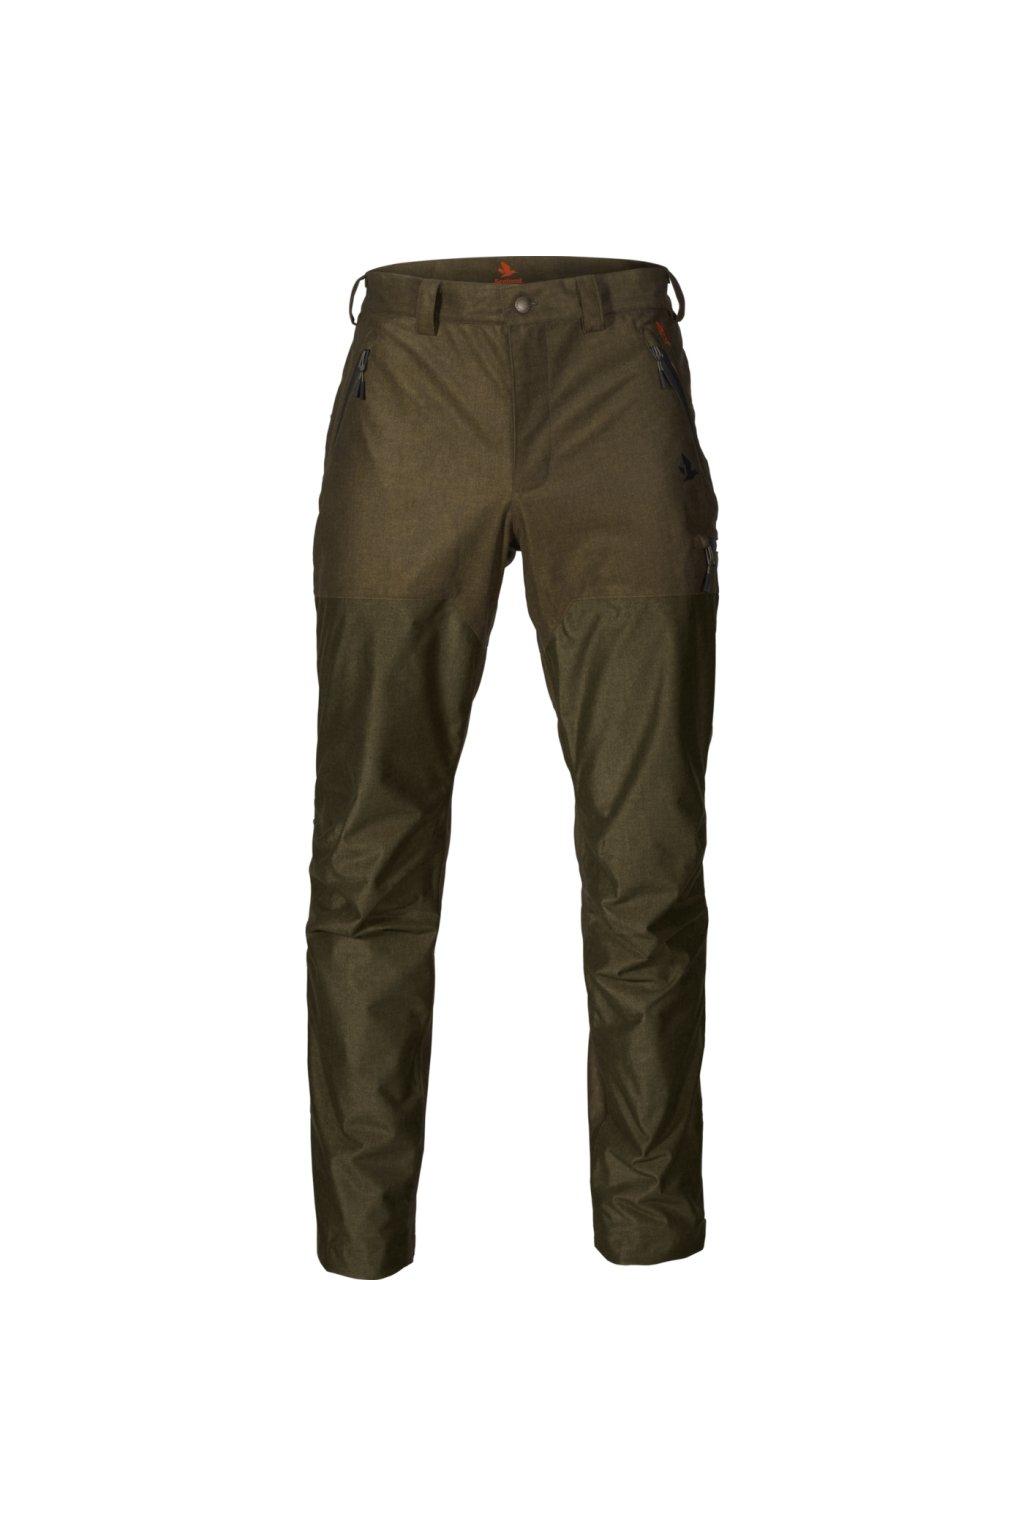 Seeland - Avail kalhoty Pine green melange